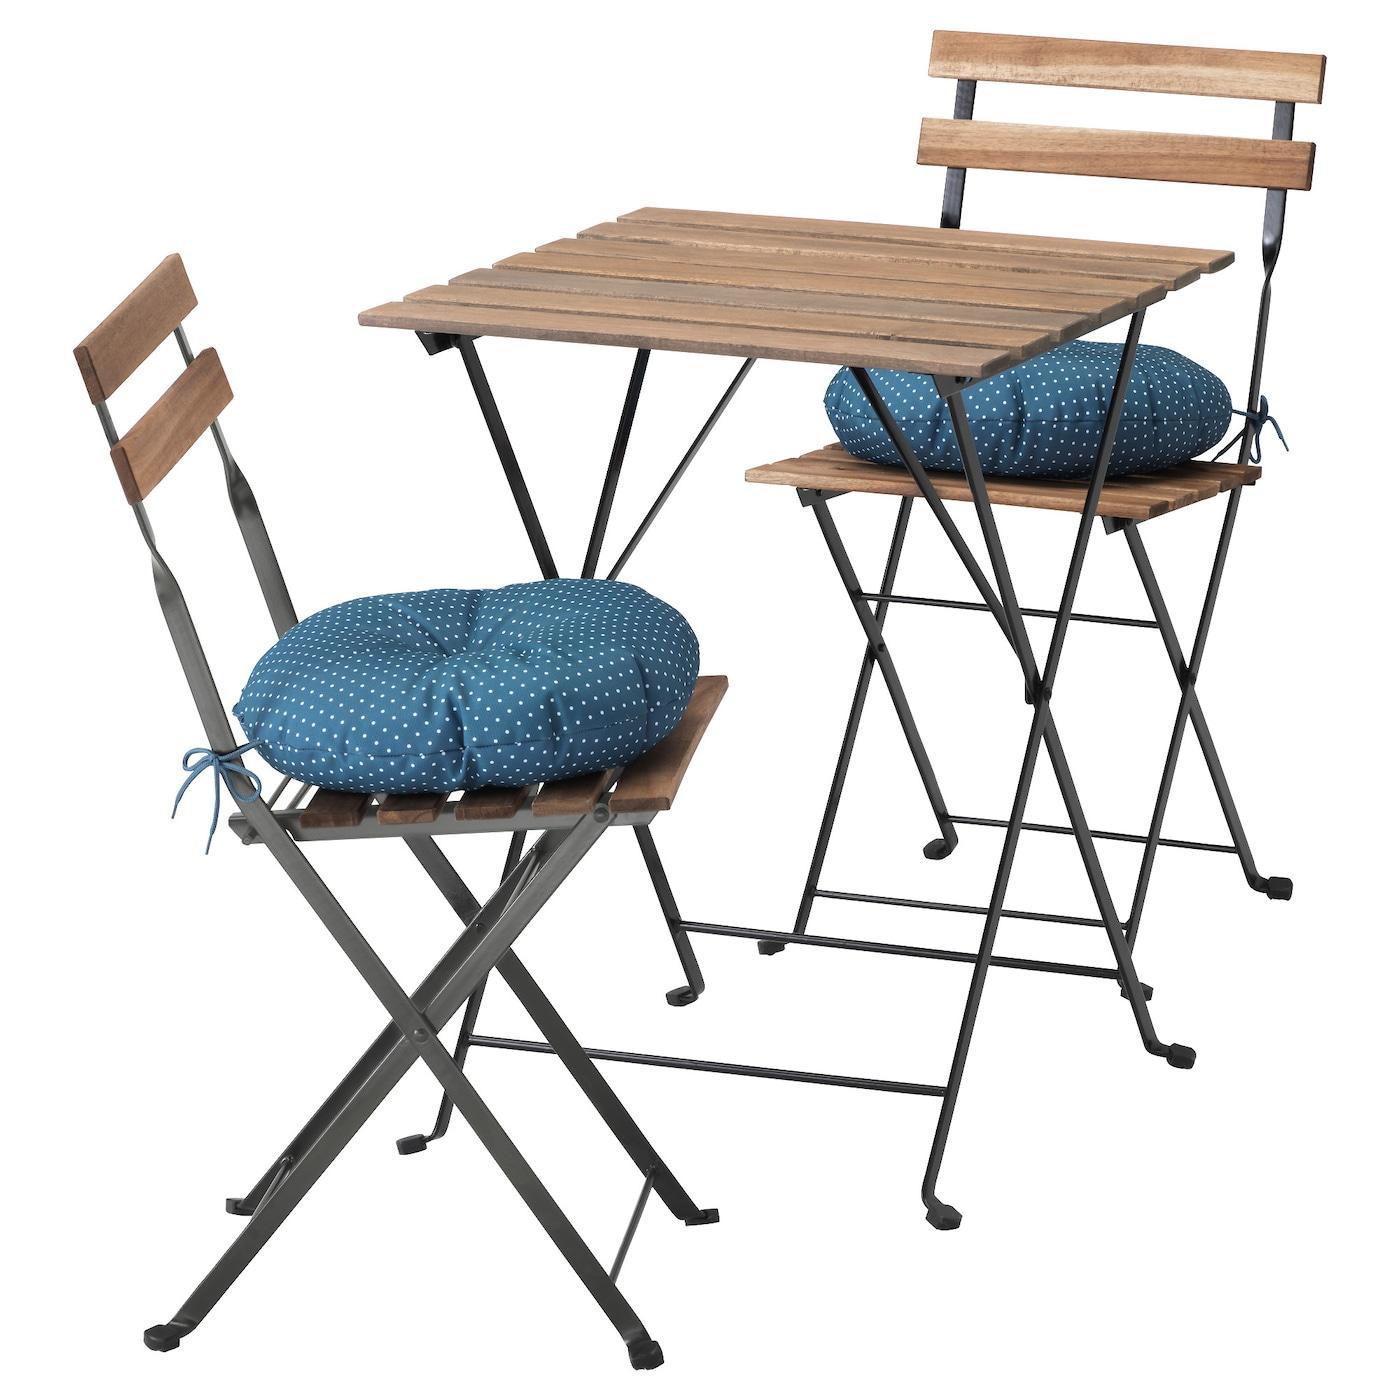 Garden Tables & Chairs Garden Furniture Sets